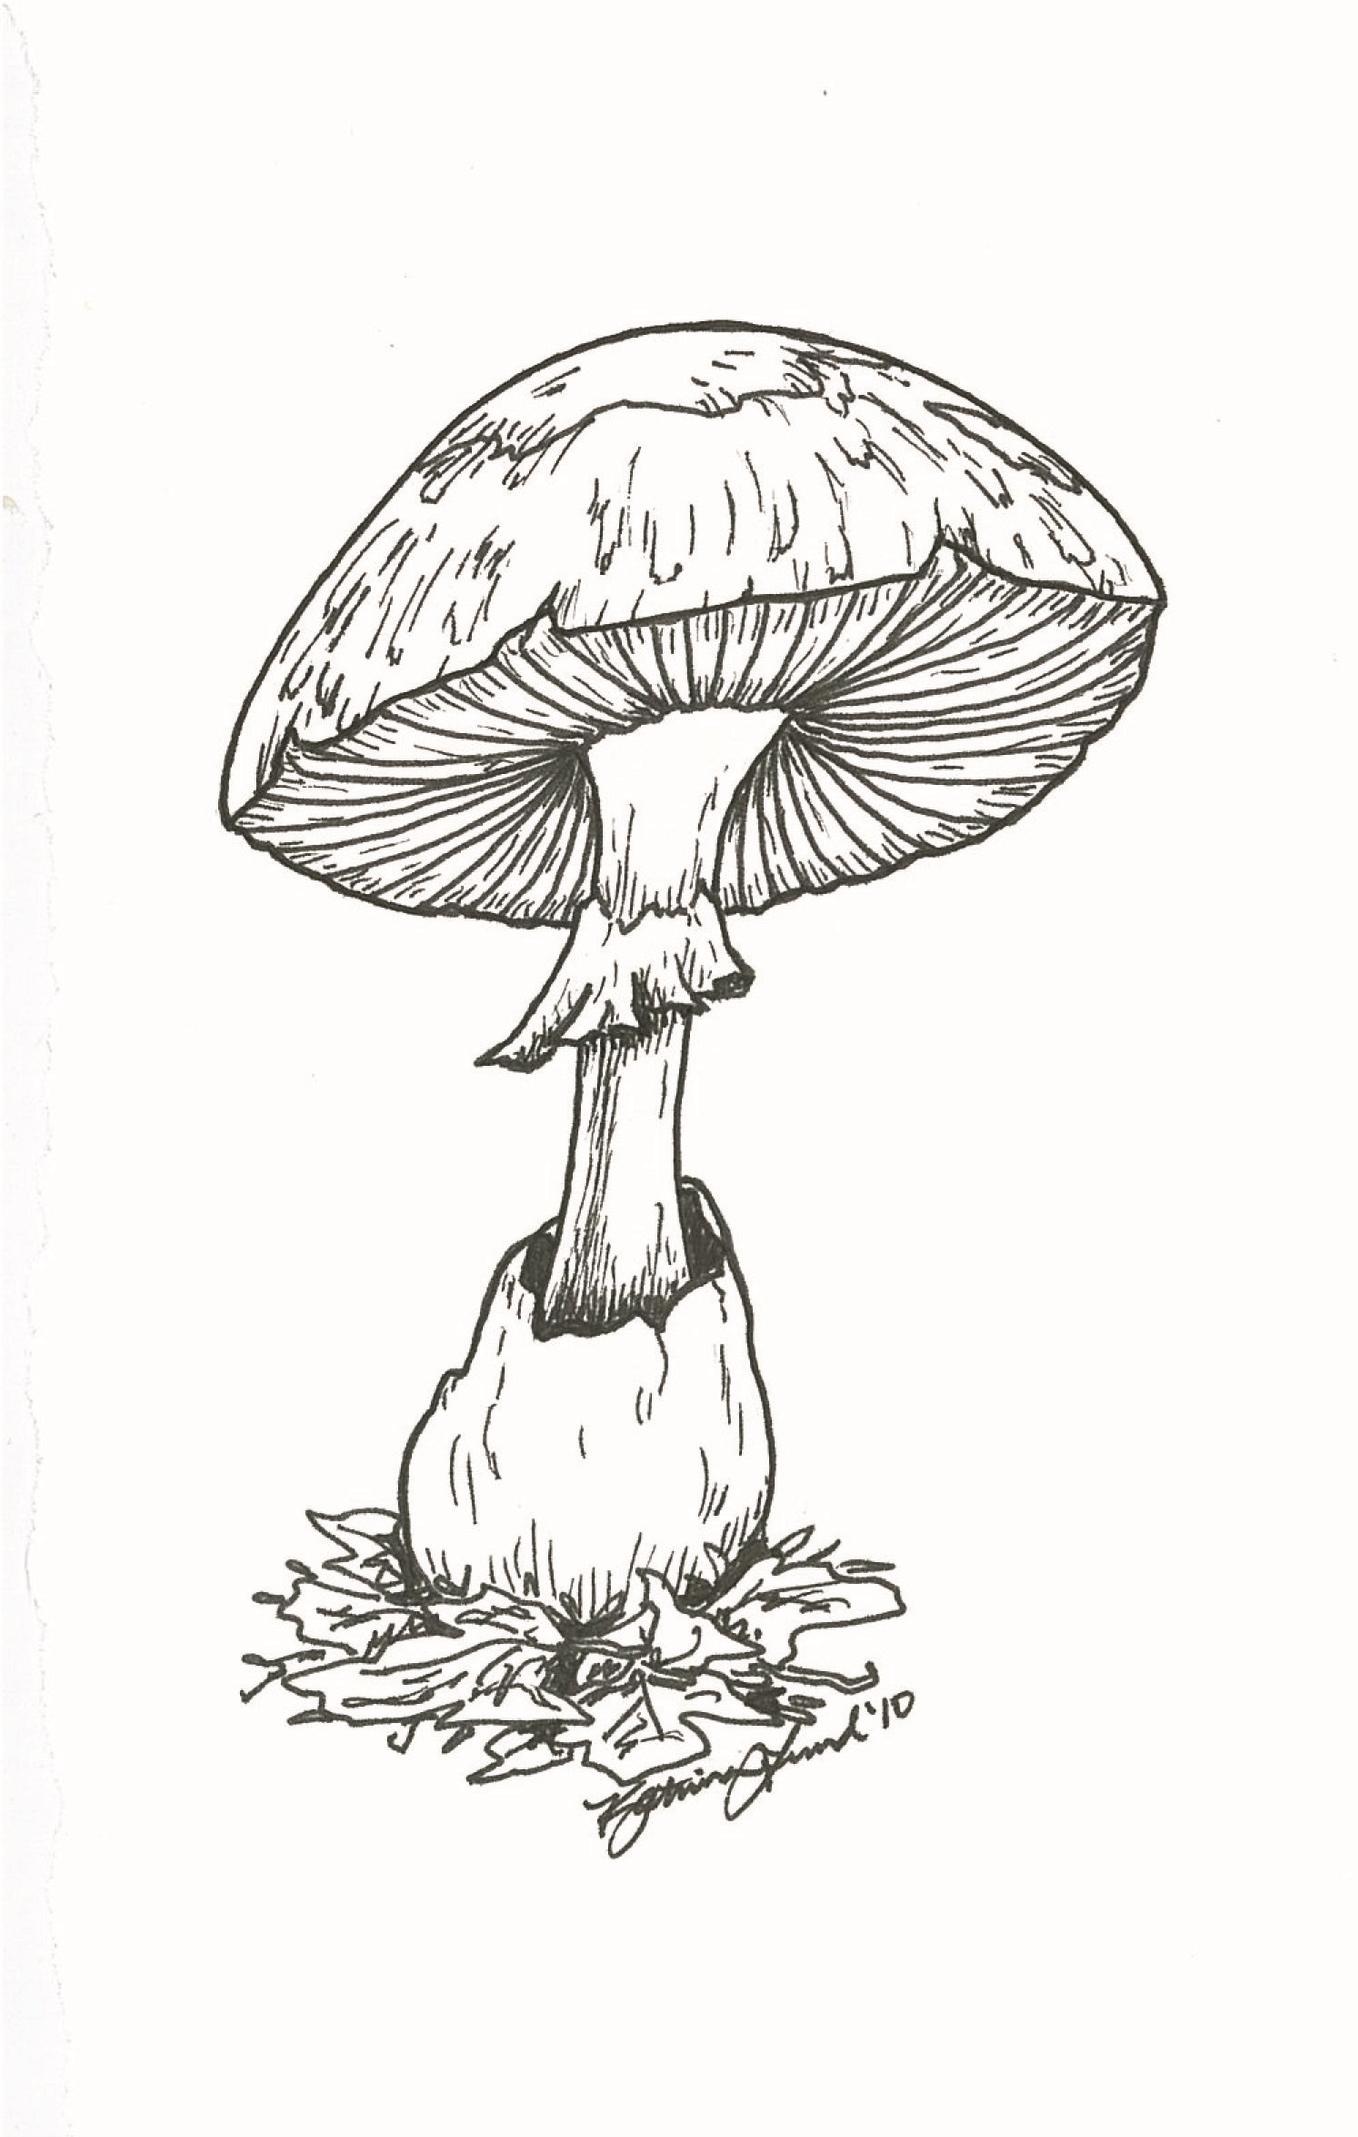 Some Sort of Mushroom